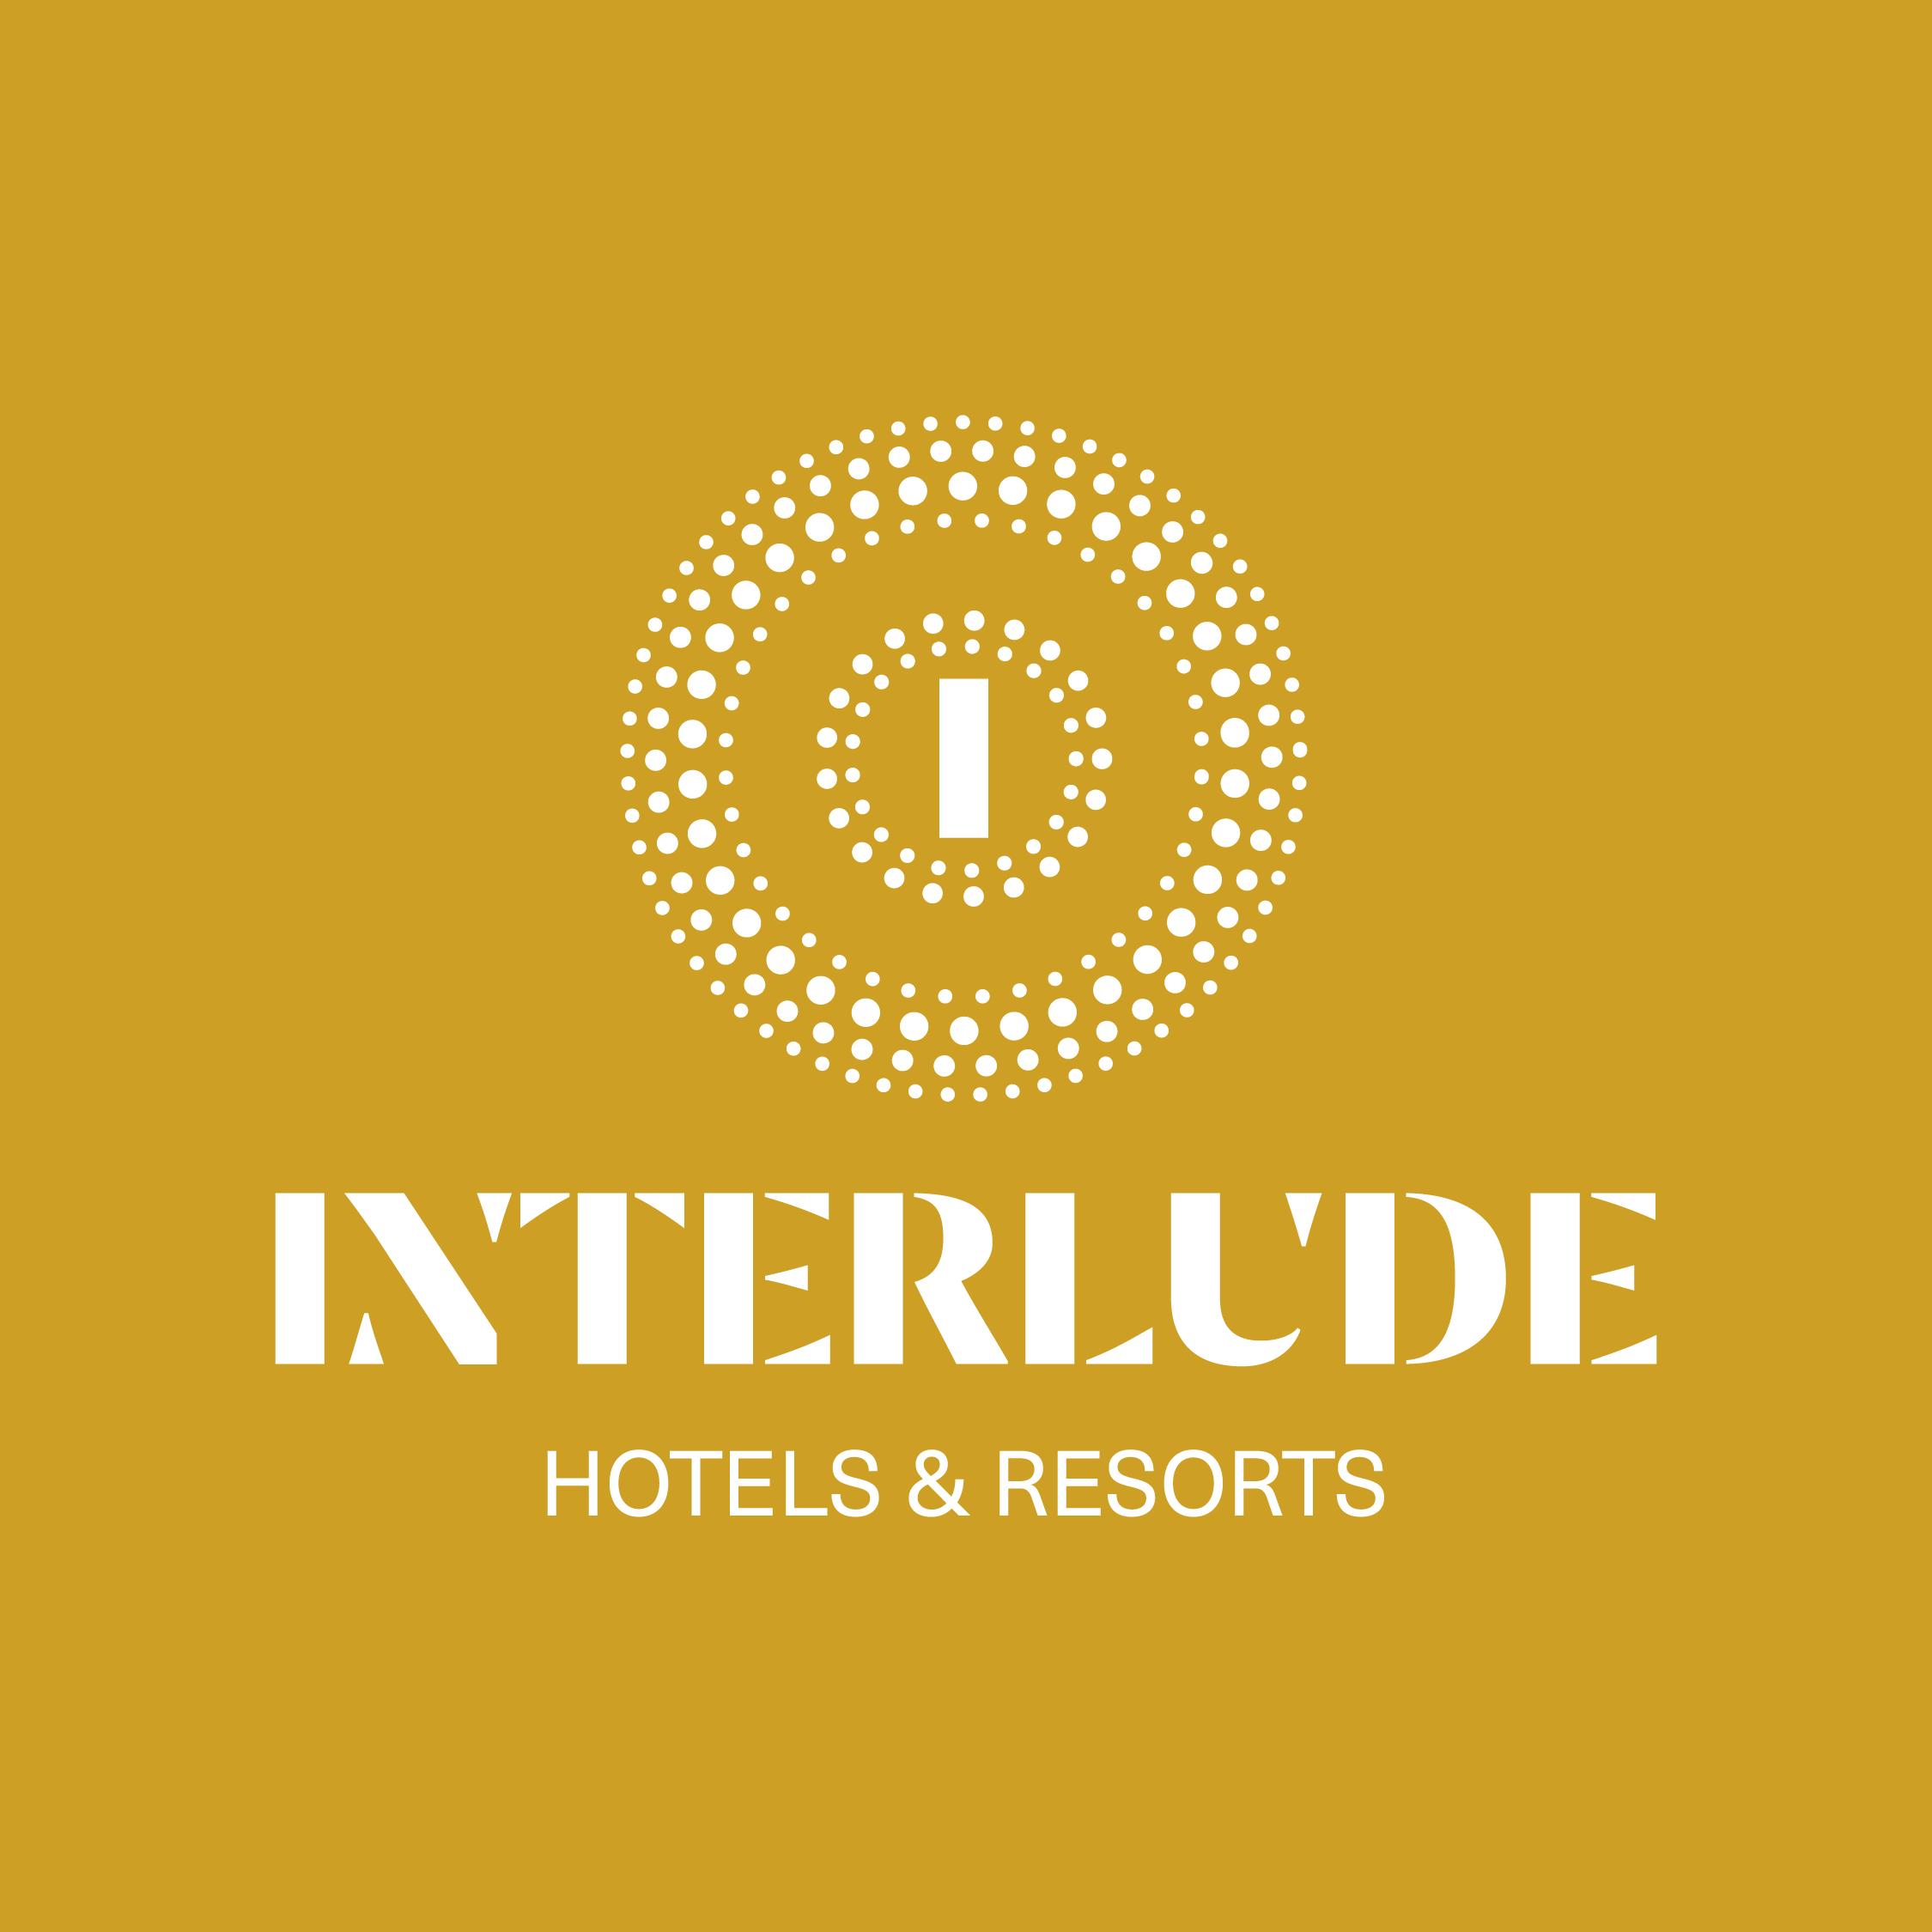 Interlude Management srl